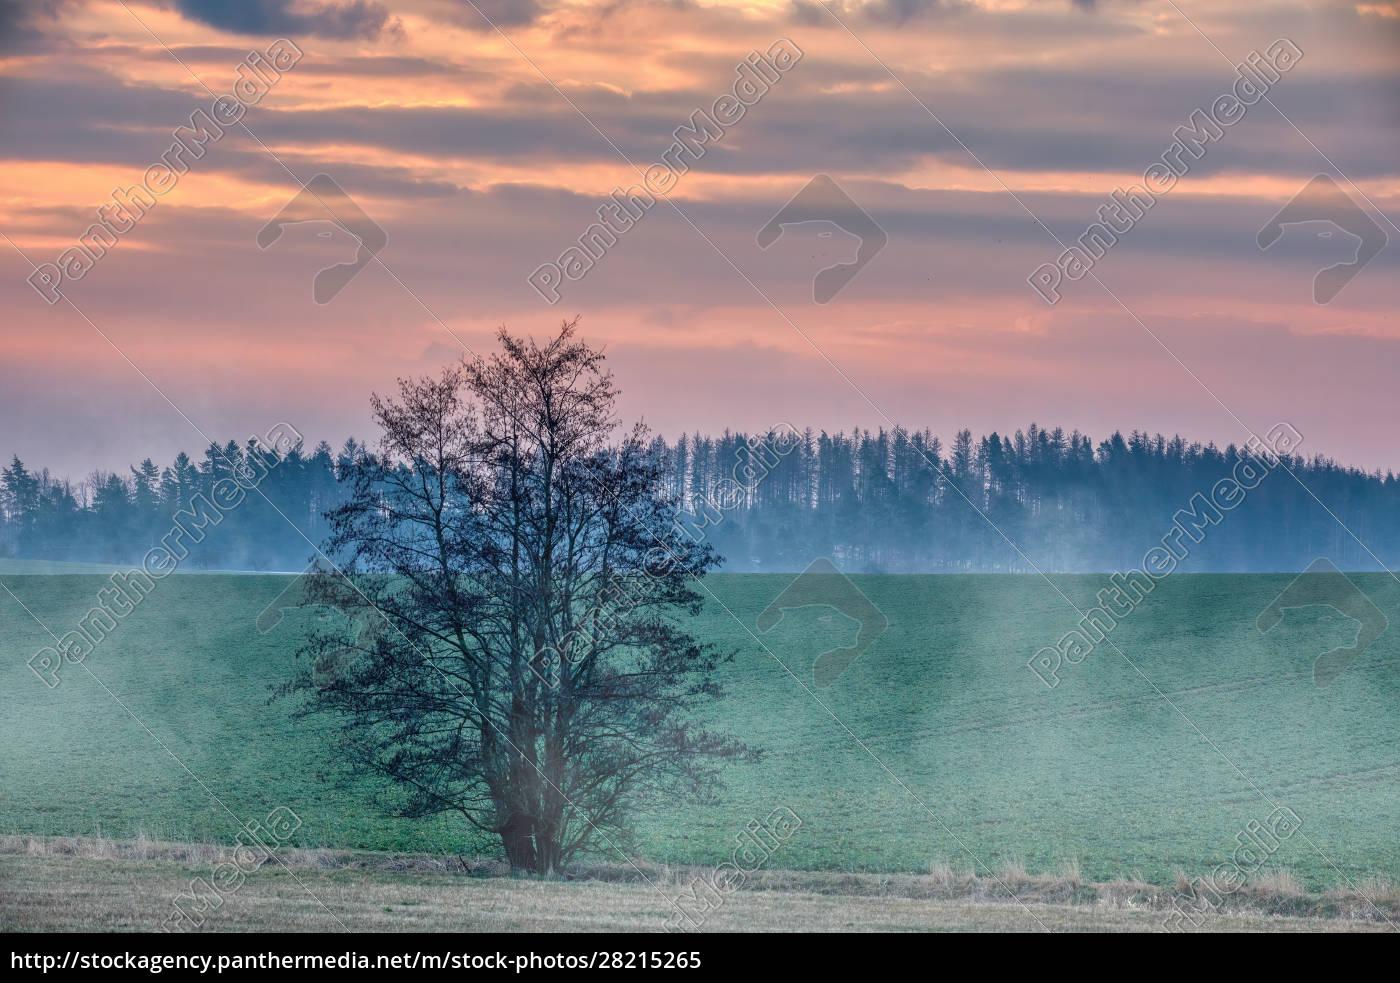 spring, foggy, and, misty, sunrise, landscape - 28215265